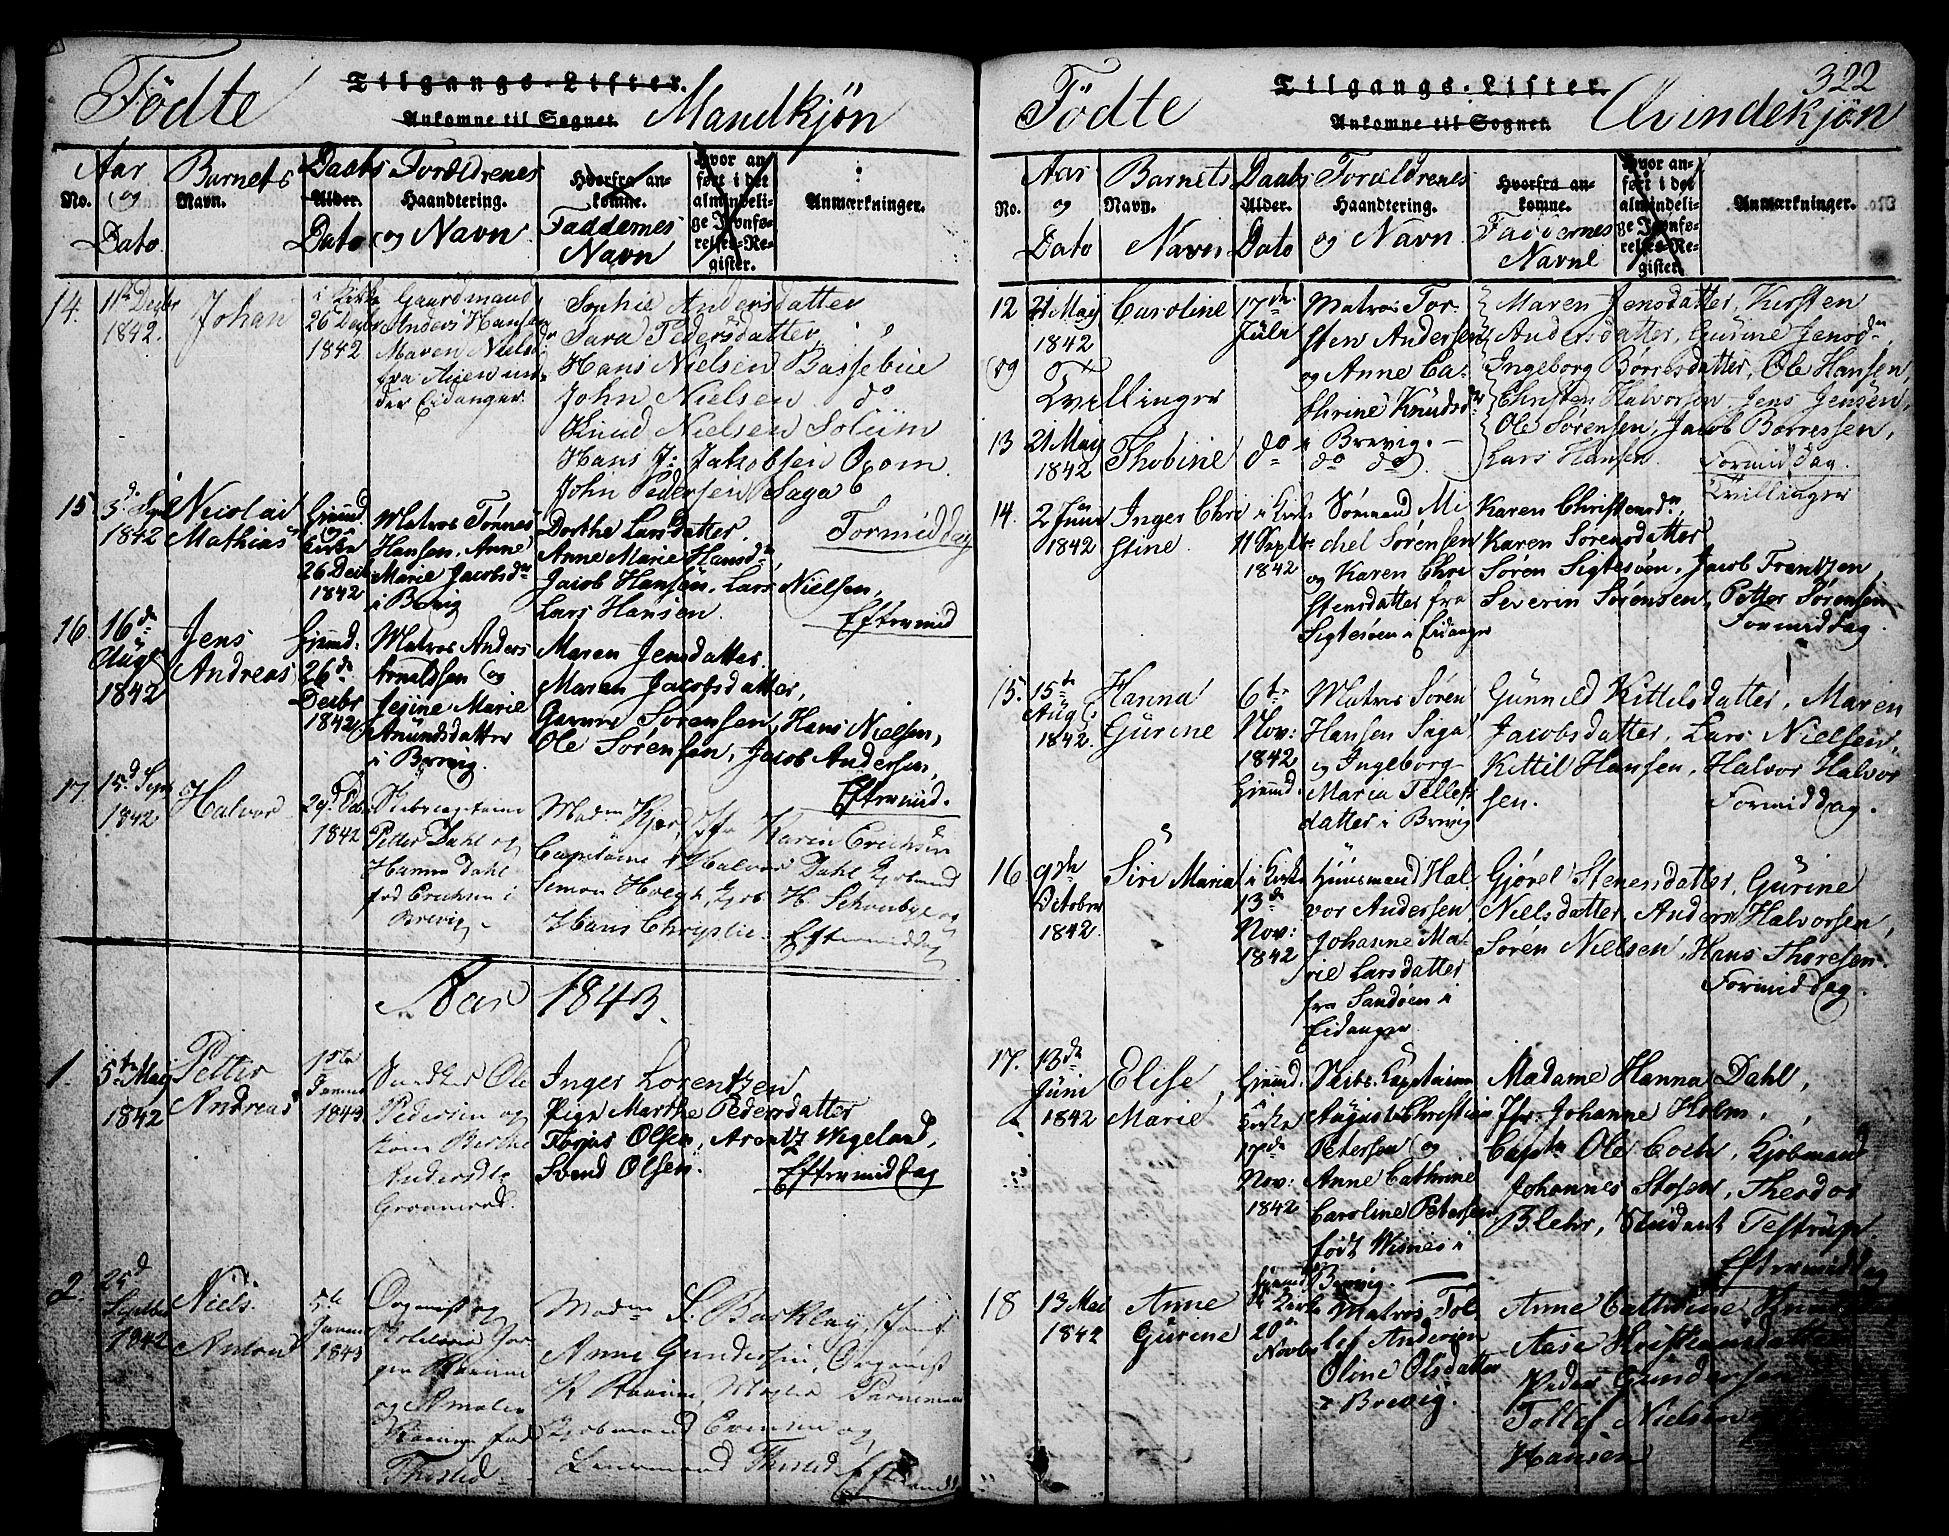 SAKO, Brevik kirkebøker, G/Ga/L0001: Klokkerbok nr. 1, 1814-1845, s. 322